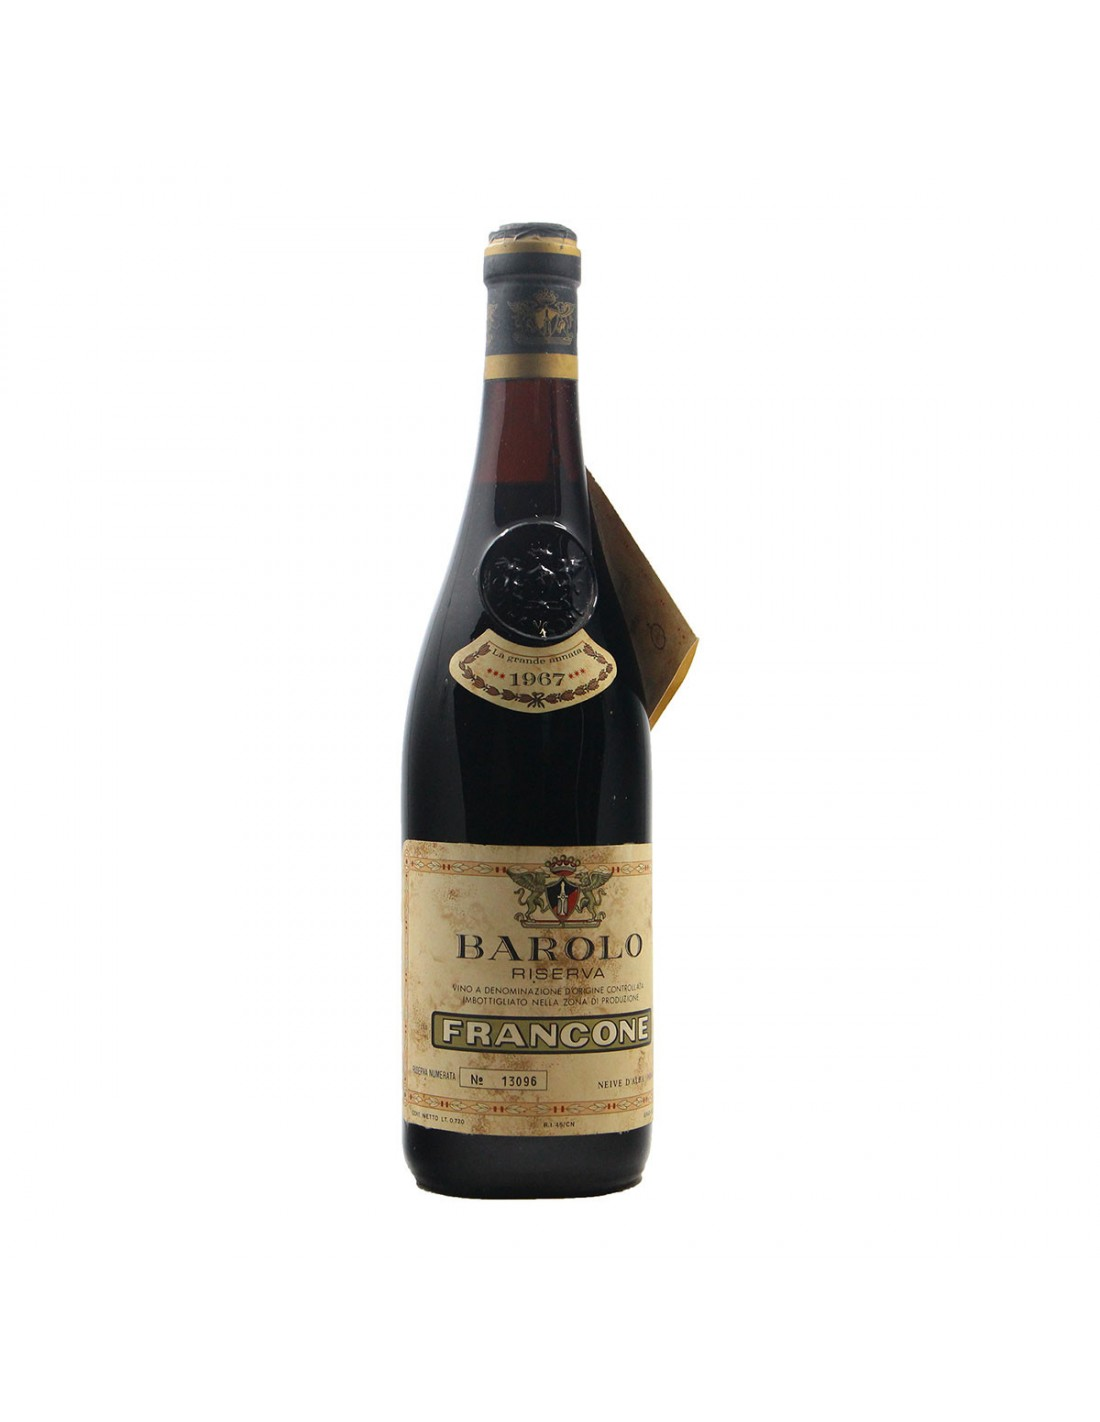 BAROLO RISERVA 1967 FRANCONE Grandi Bottiglie